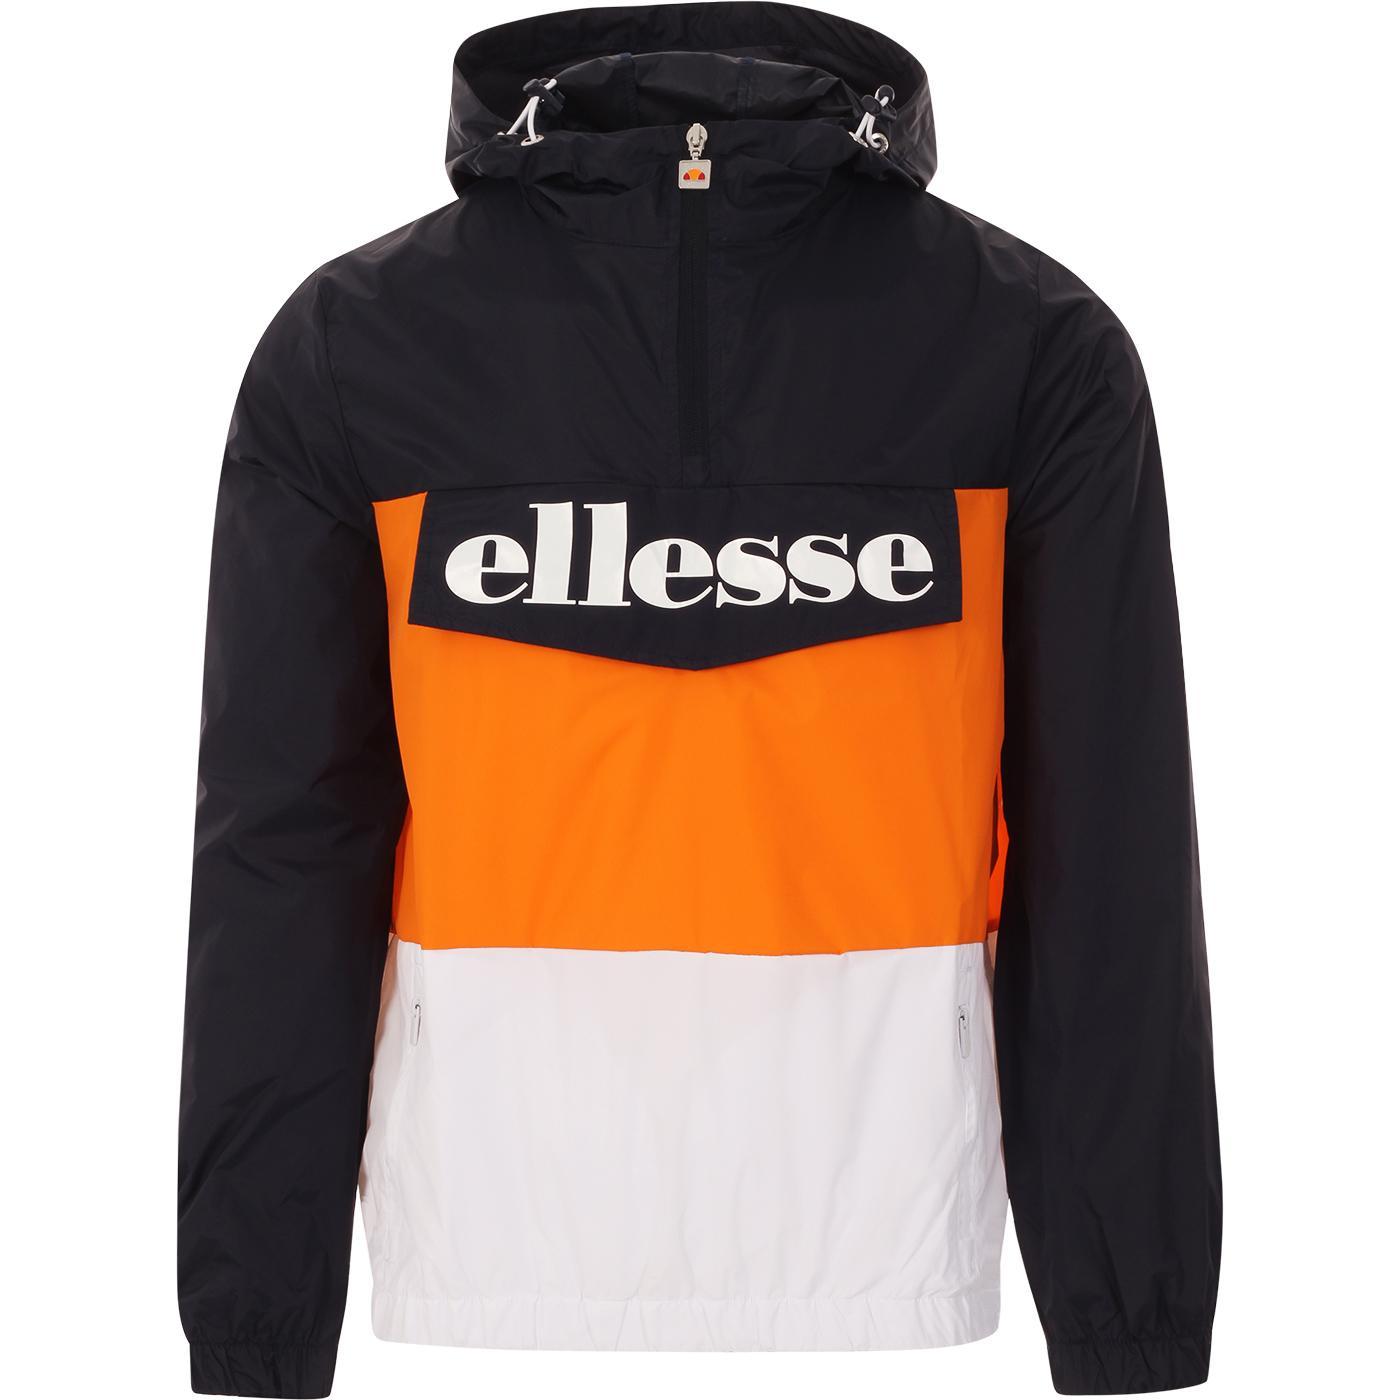 Domani ELLESSE Retro 80s Lightweight OH Jacket (N)